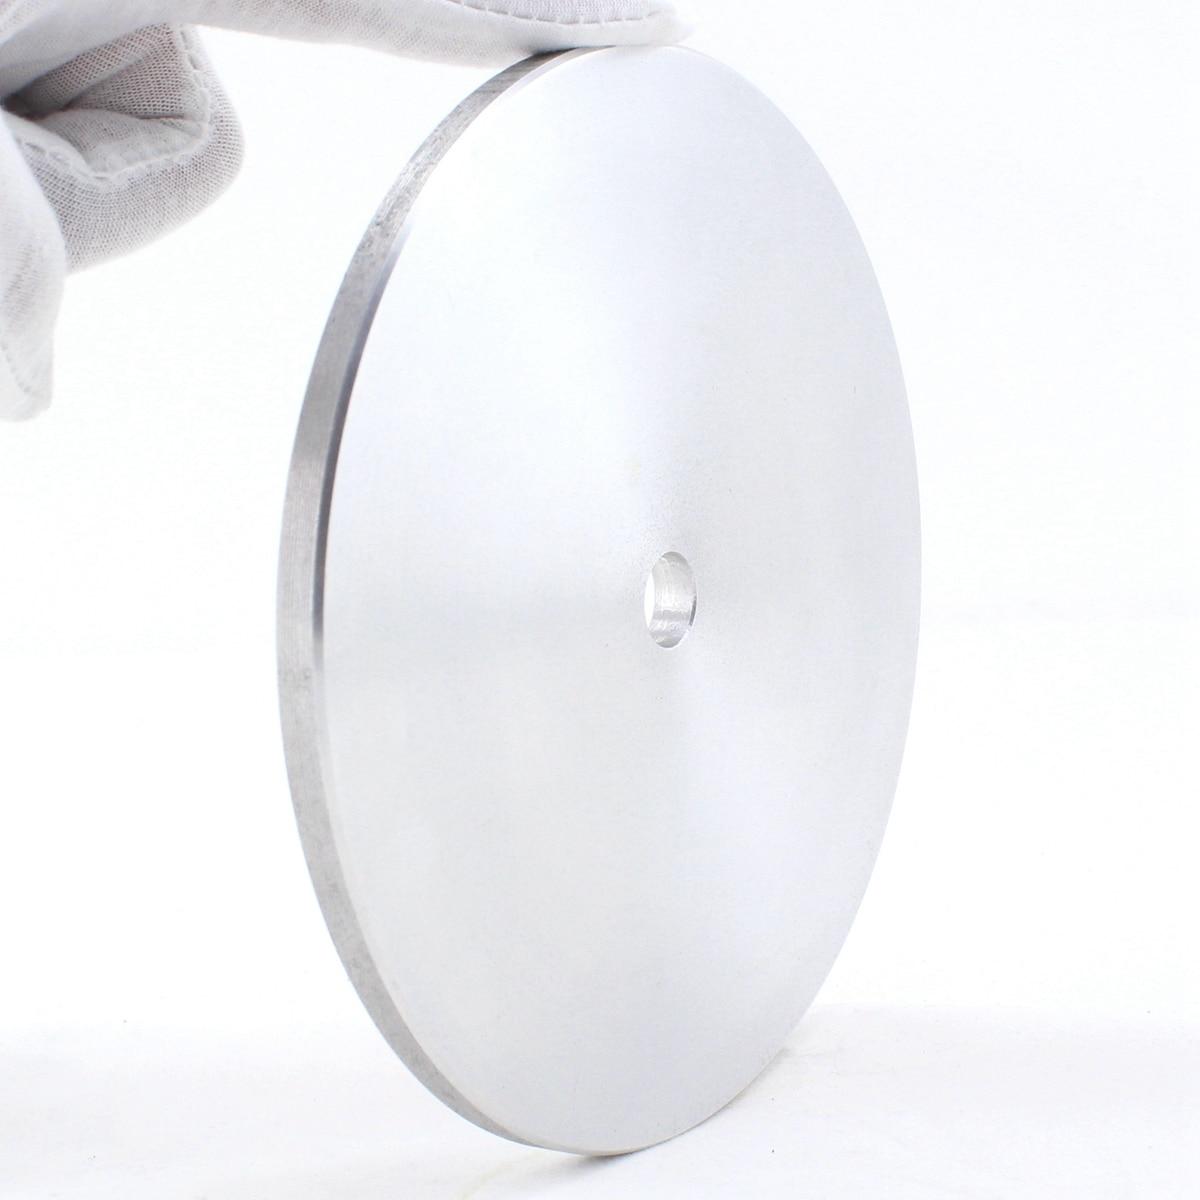 12 inch Aluminum master lap for Diamond coated Flat Lap Disk Grinding wheel ILOVETOOL 6 inch lapidary concave arc diamond coated grinding wheel grind spherical 6 mm ilovetool